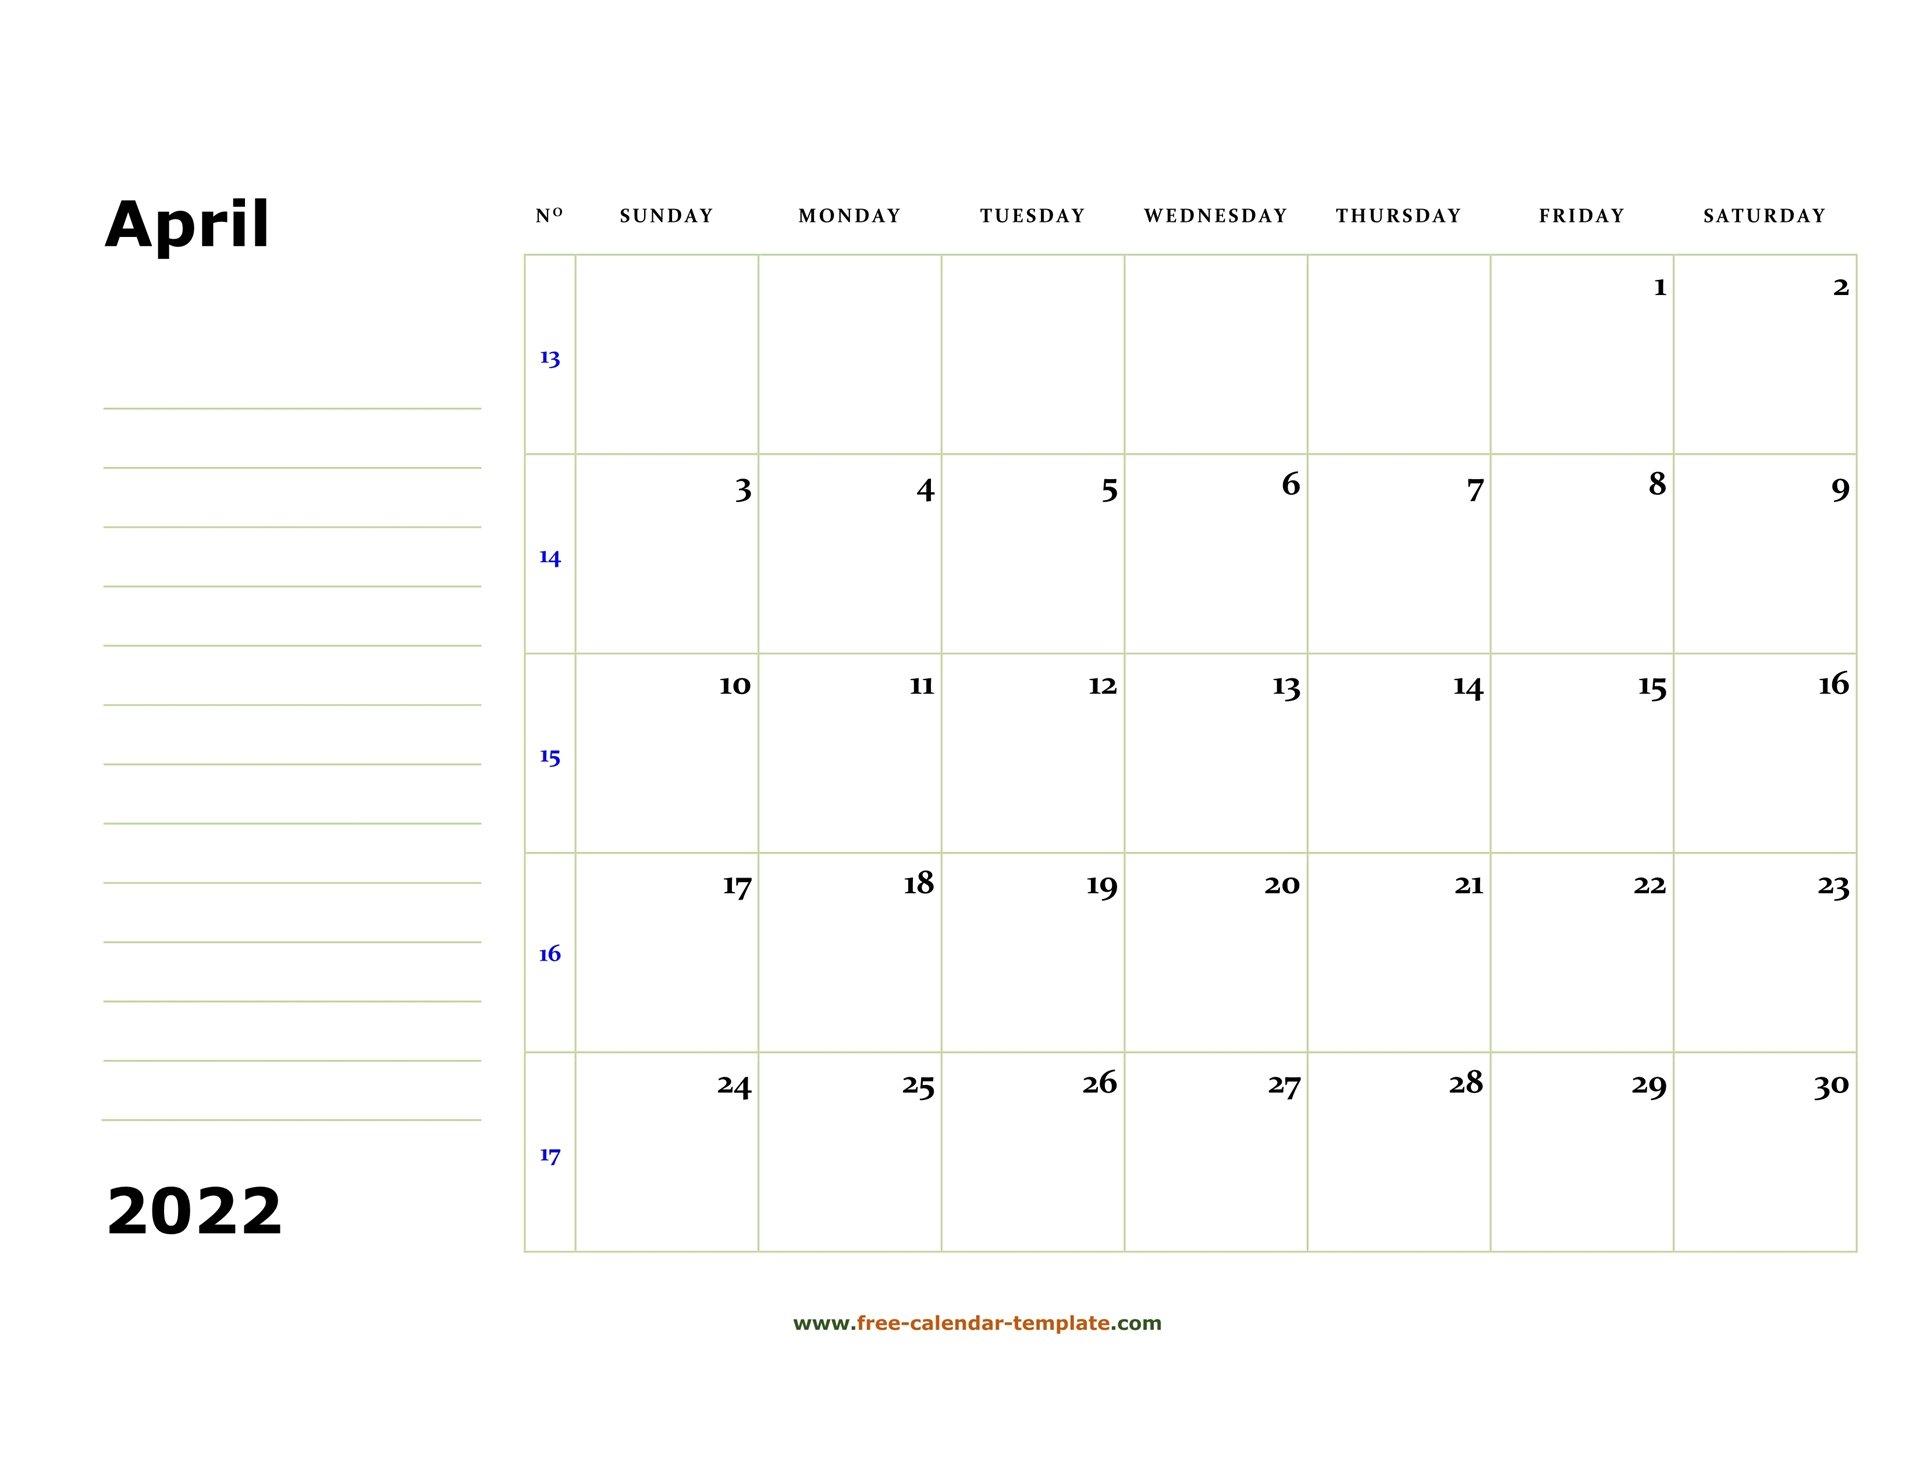 Printable April 2022 Calendar (Box And Lines For Notes with regard to April 2022 Printable Calendar Free Photo